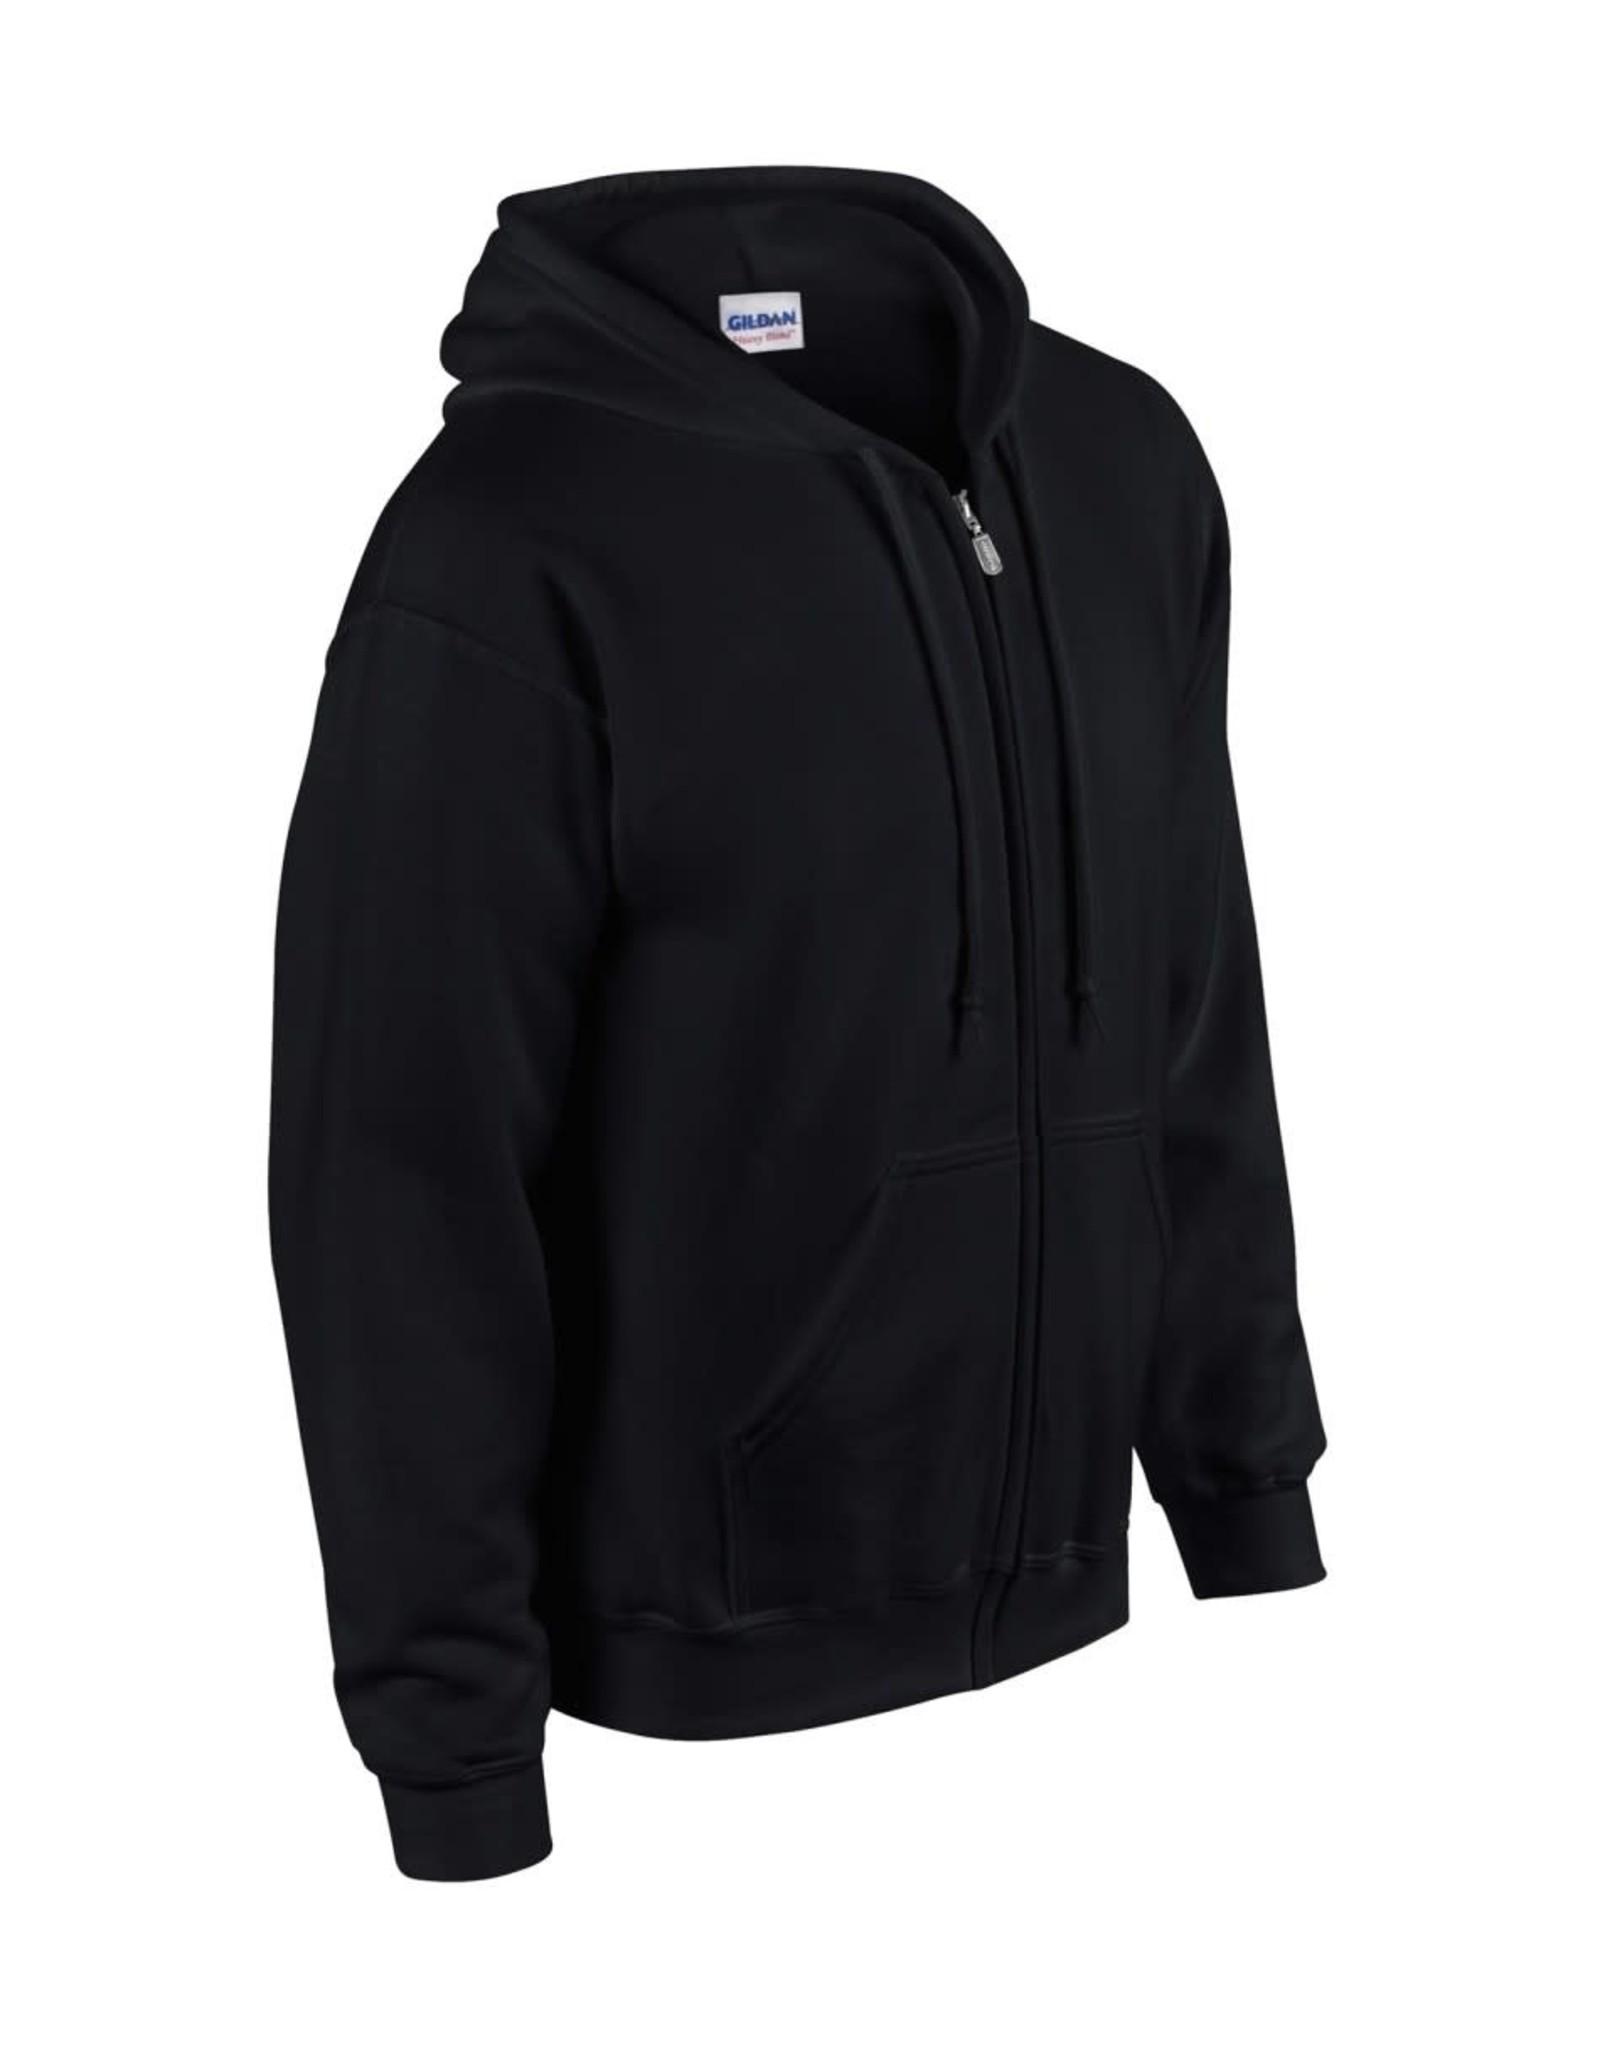 GILDAN Gildan Heavy Blend Full Zip Hooded Sweatshirt